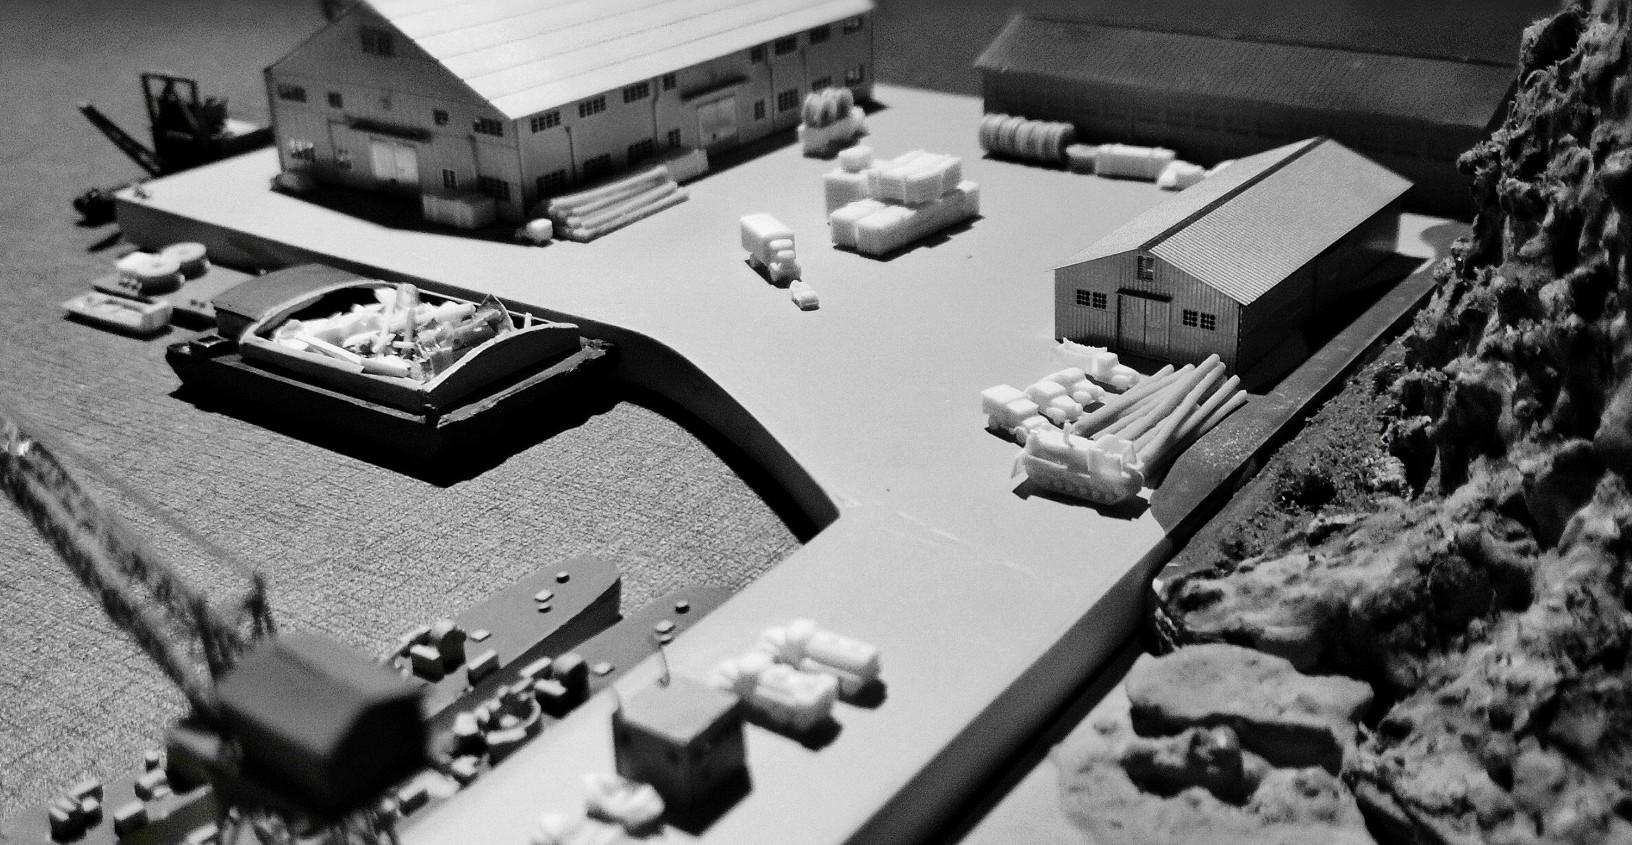 Diorama base navale 1/700 par Nesquik - Page 3 VhKQ1bYFI